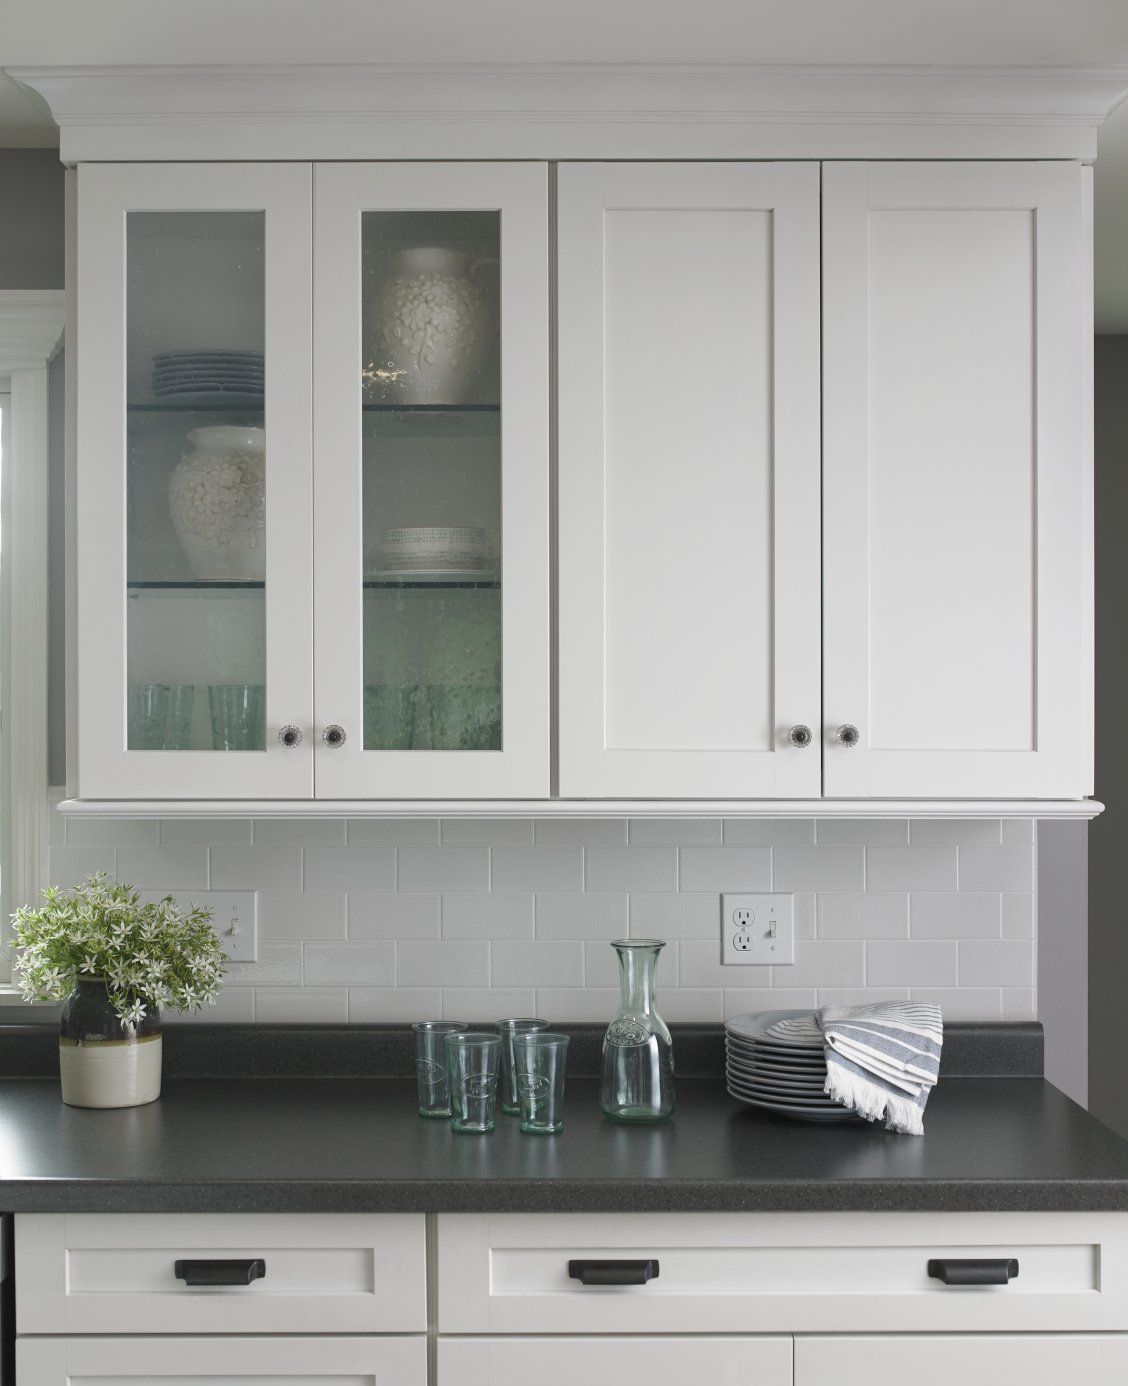 Refinishing Laminate Kitchen Cabinets: Black Shalestone Countertop